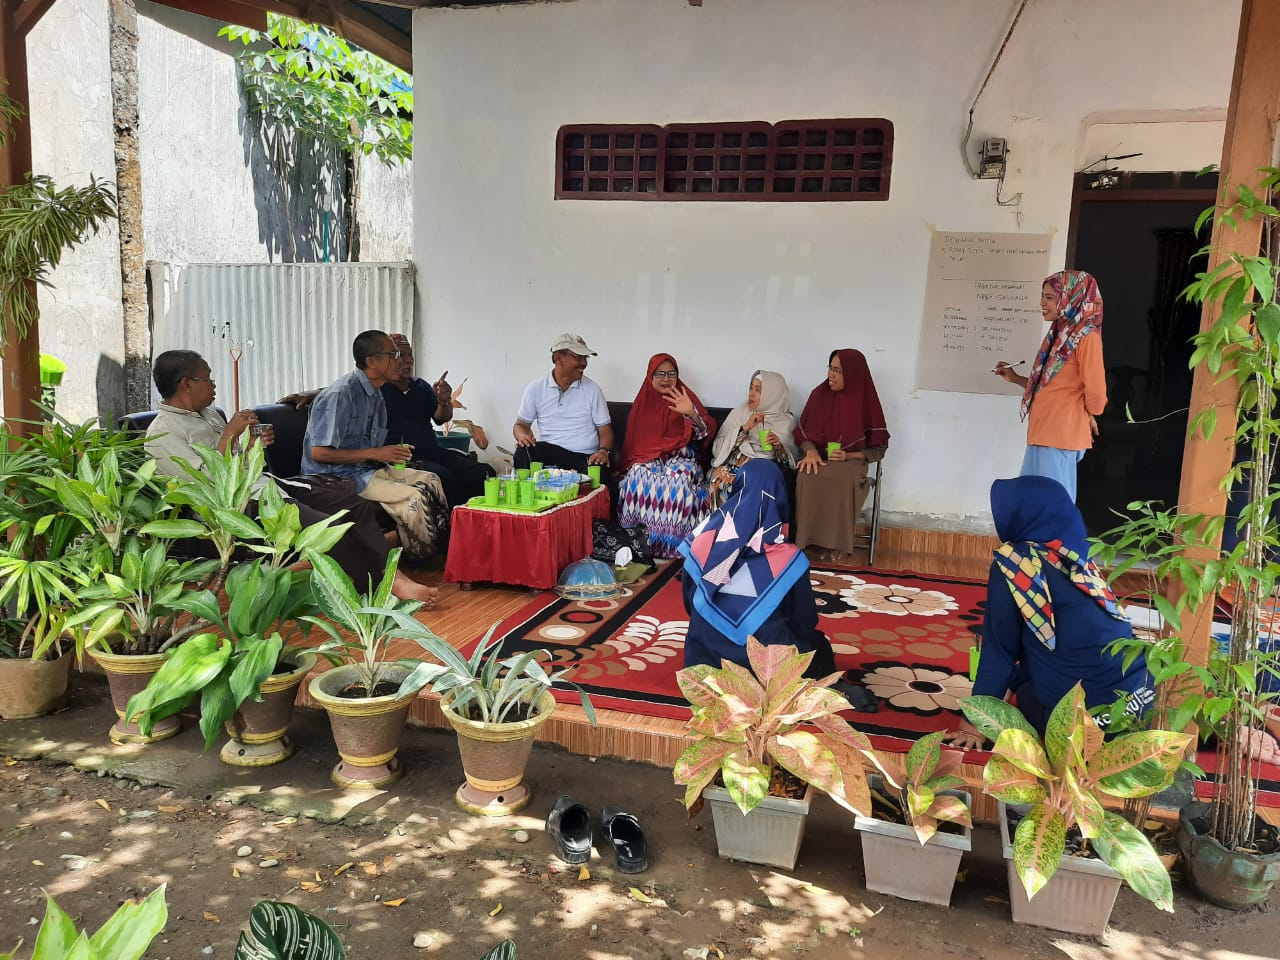 Lurah Biru Fasilitasi Pembentukan KPP Bersama BAM Mattulu Parajo Kelurahan Biru